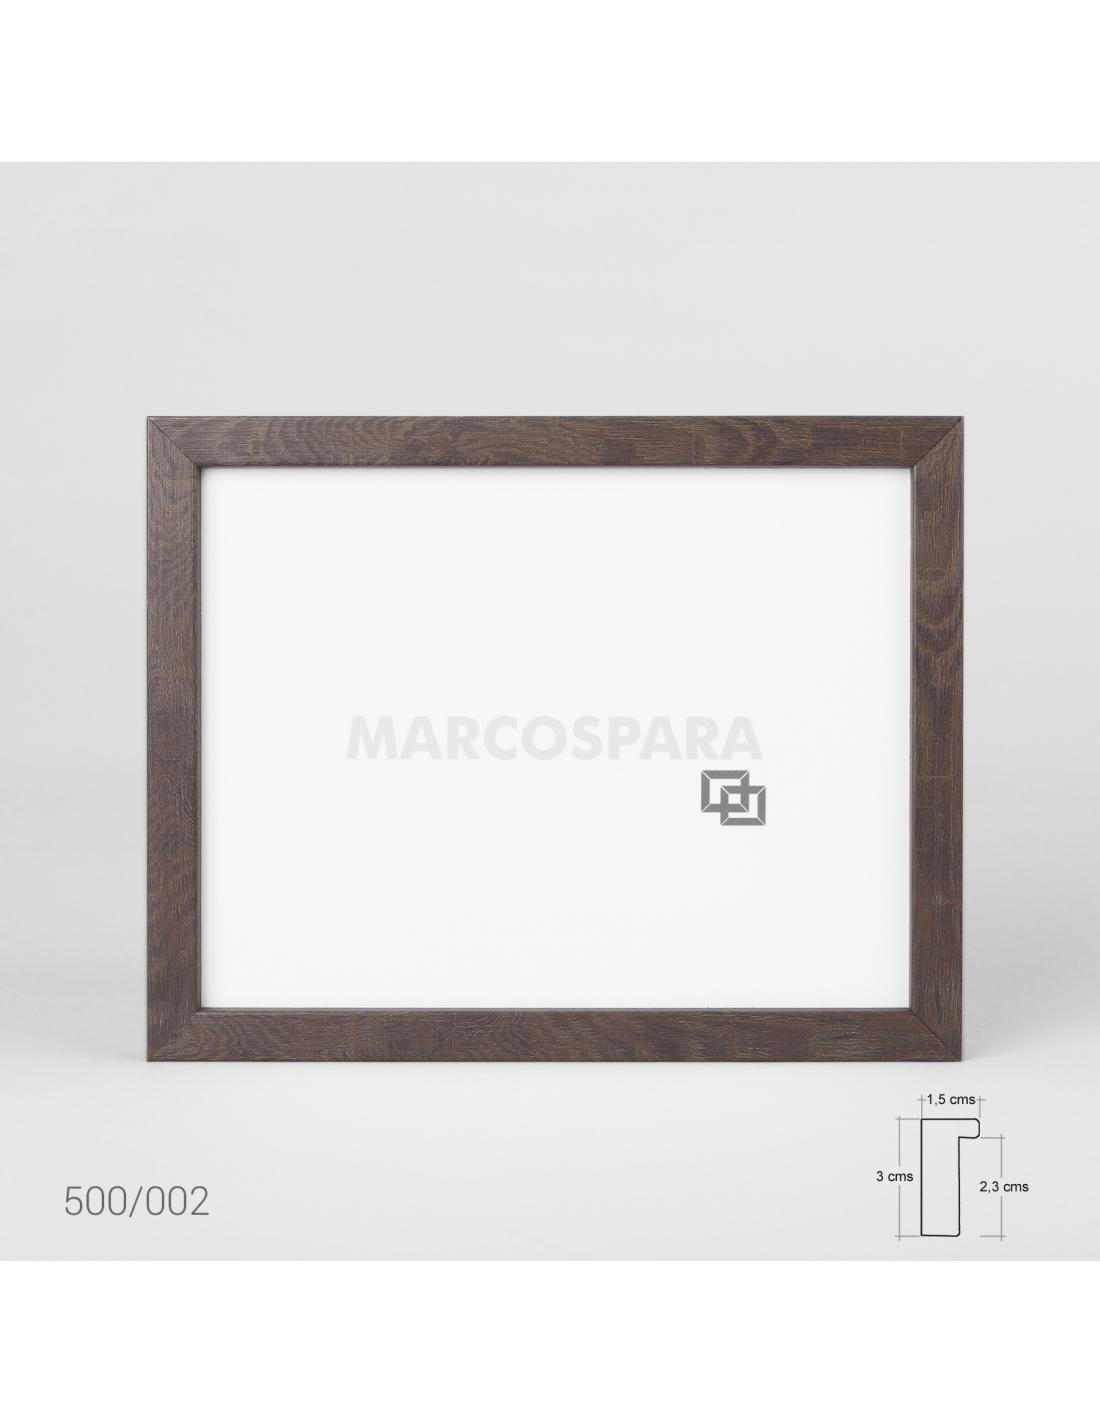 Marcos de madera para Puzzles M500